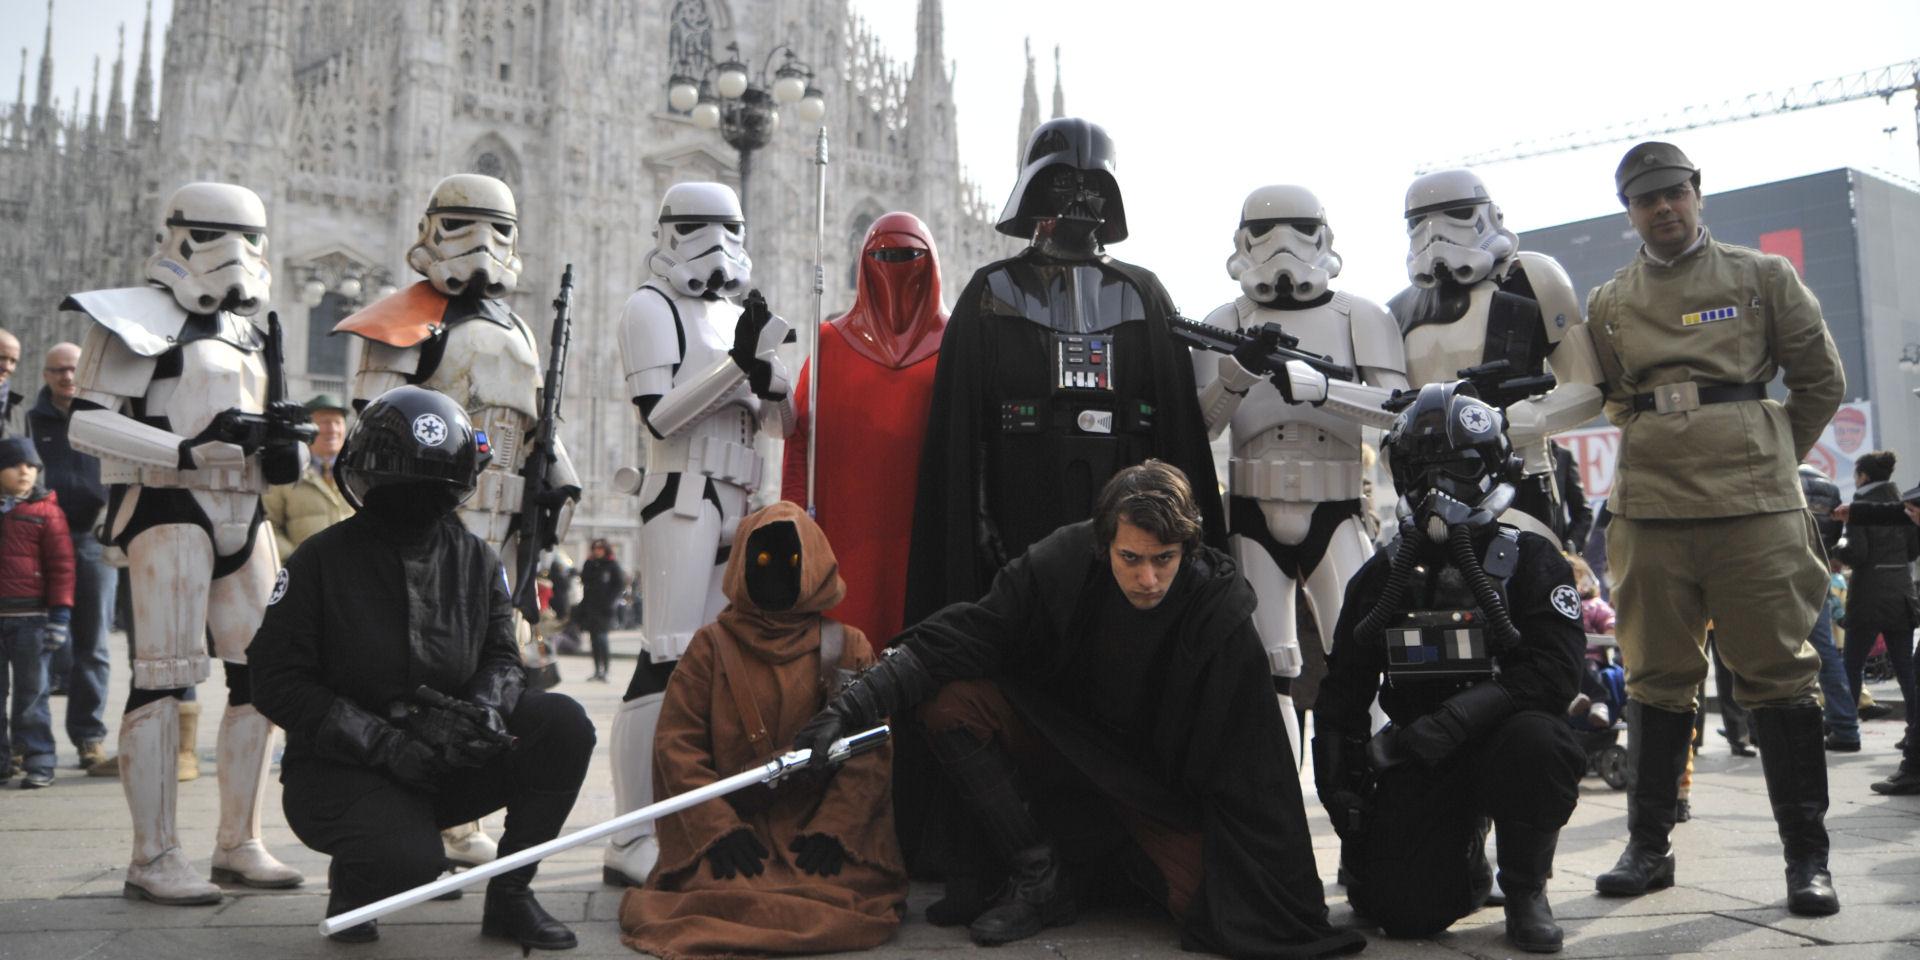 Star Wars, Ravenna